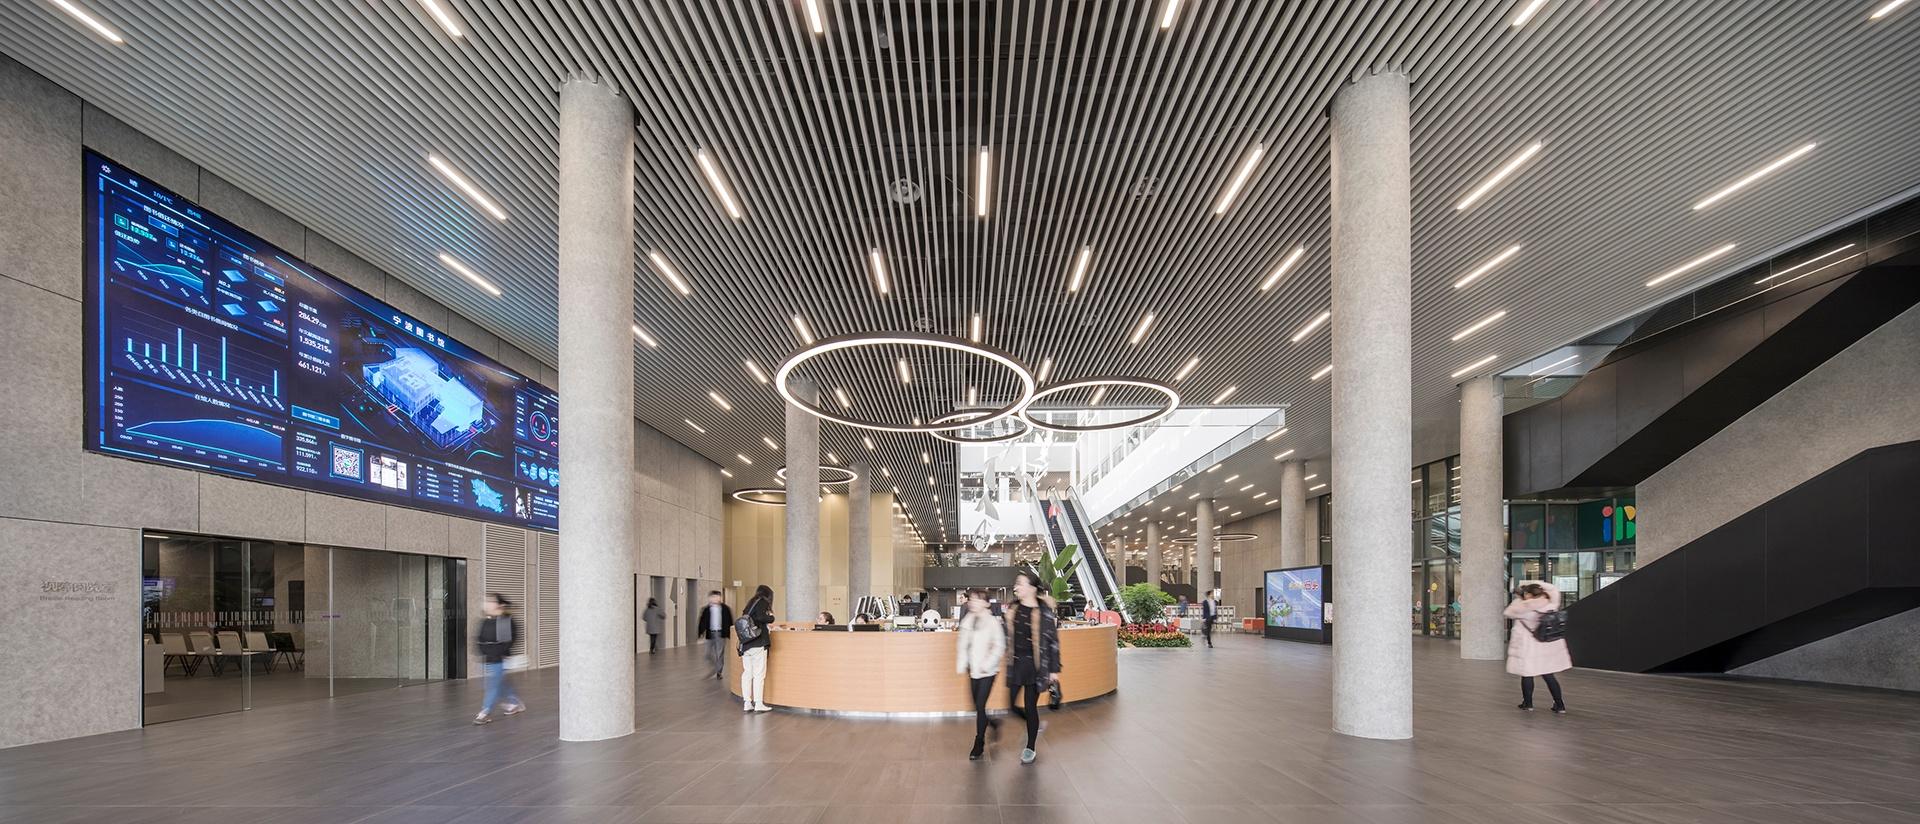 Schmidt Hammer Lassen Architects_Ningbo New Library_08__1600